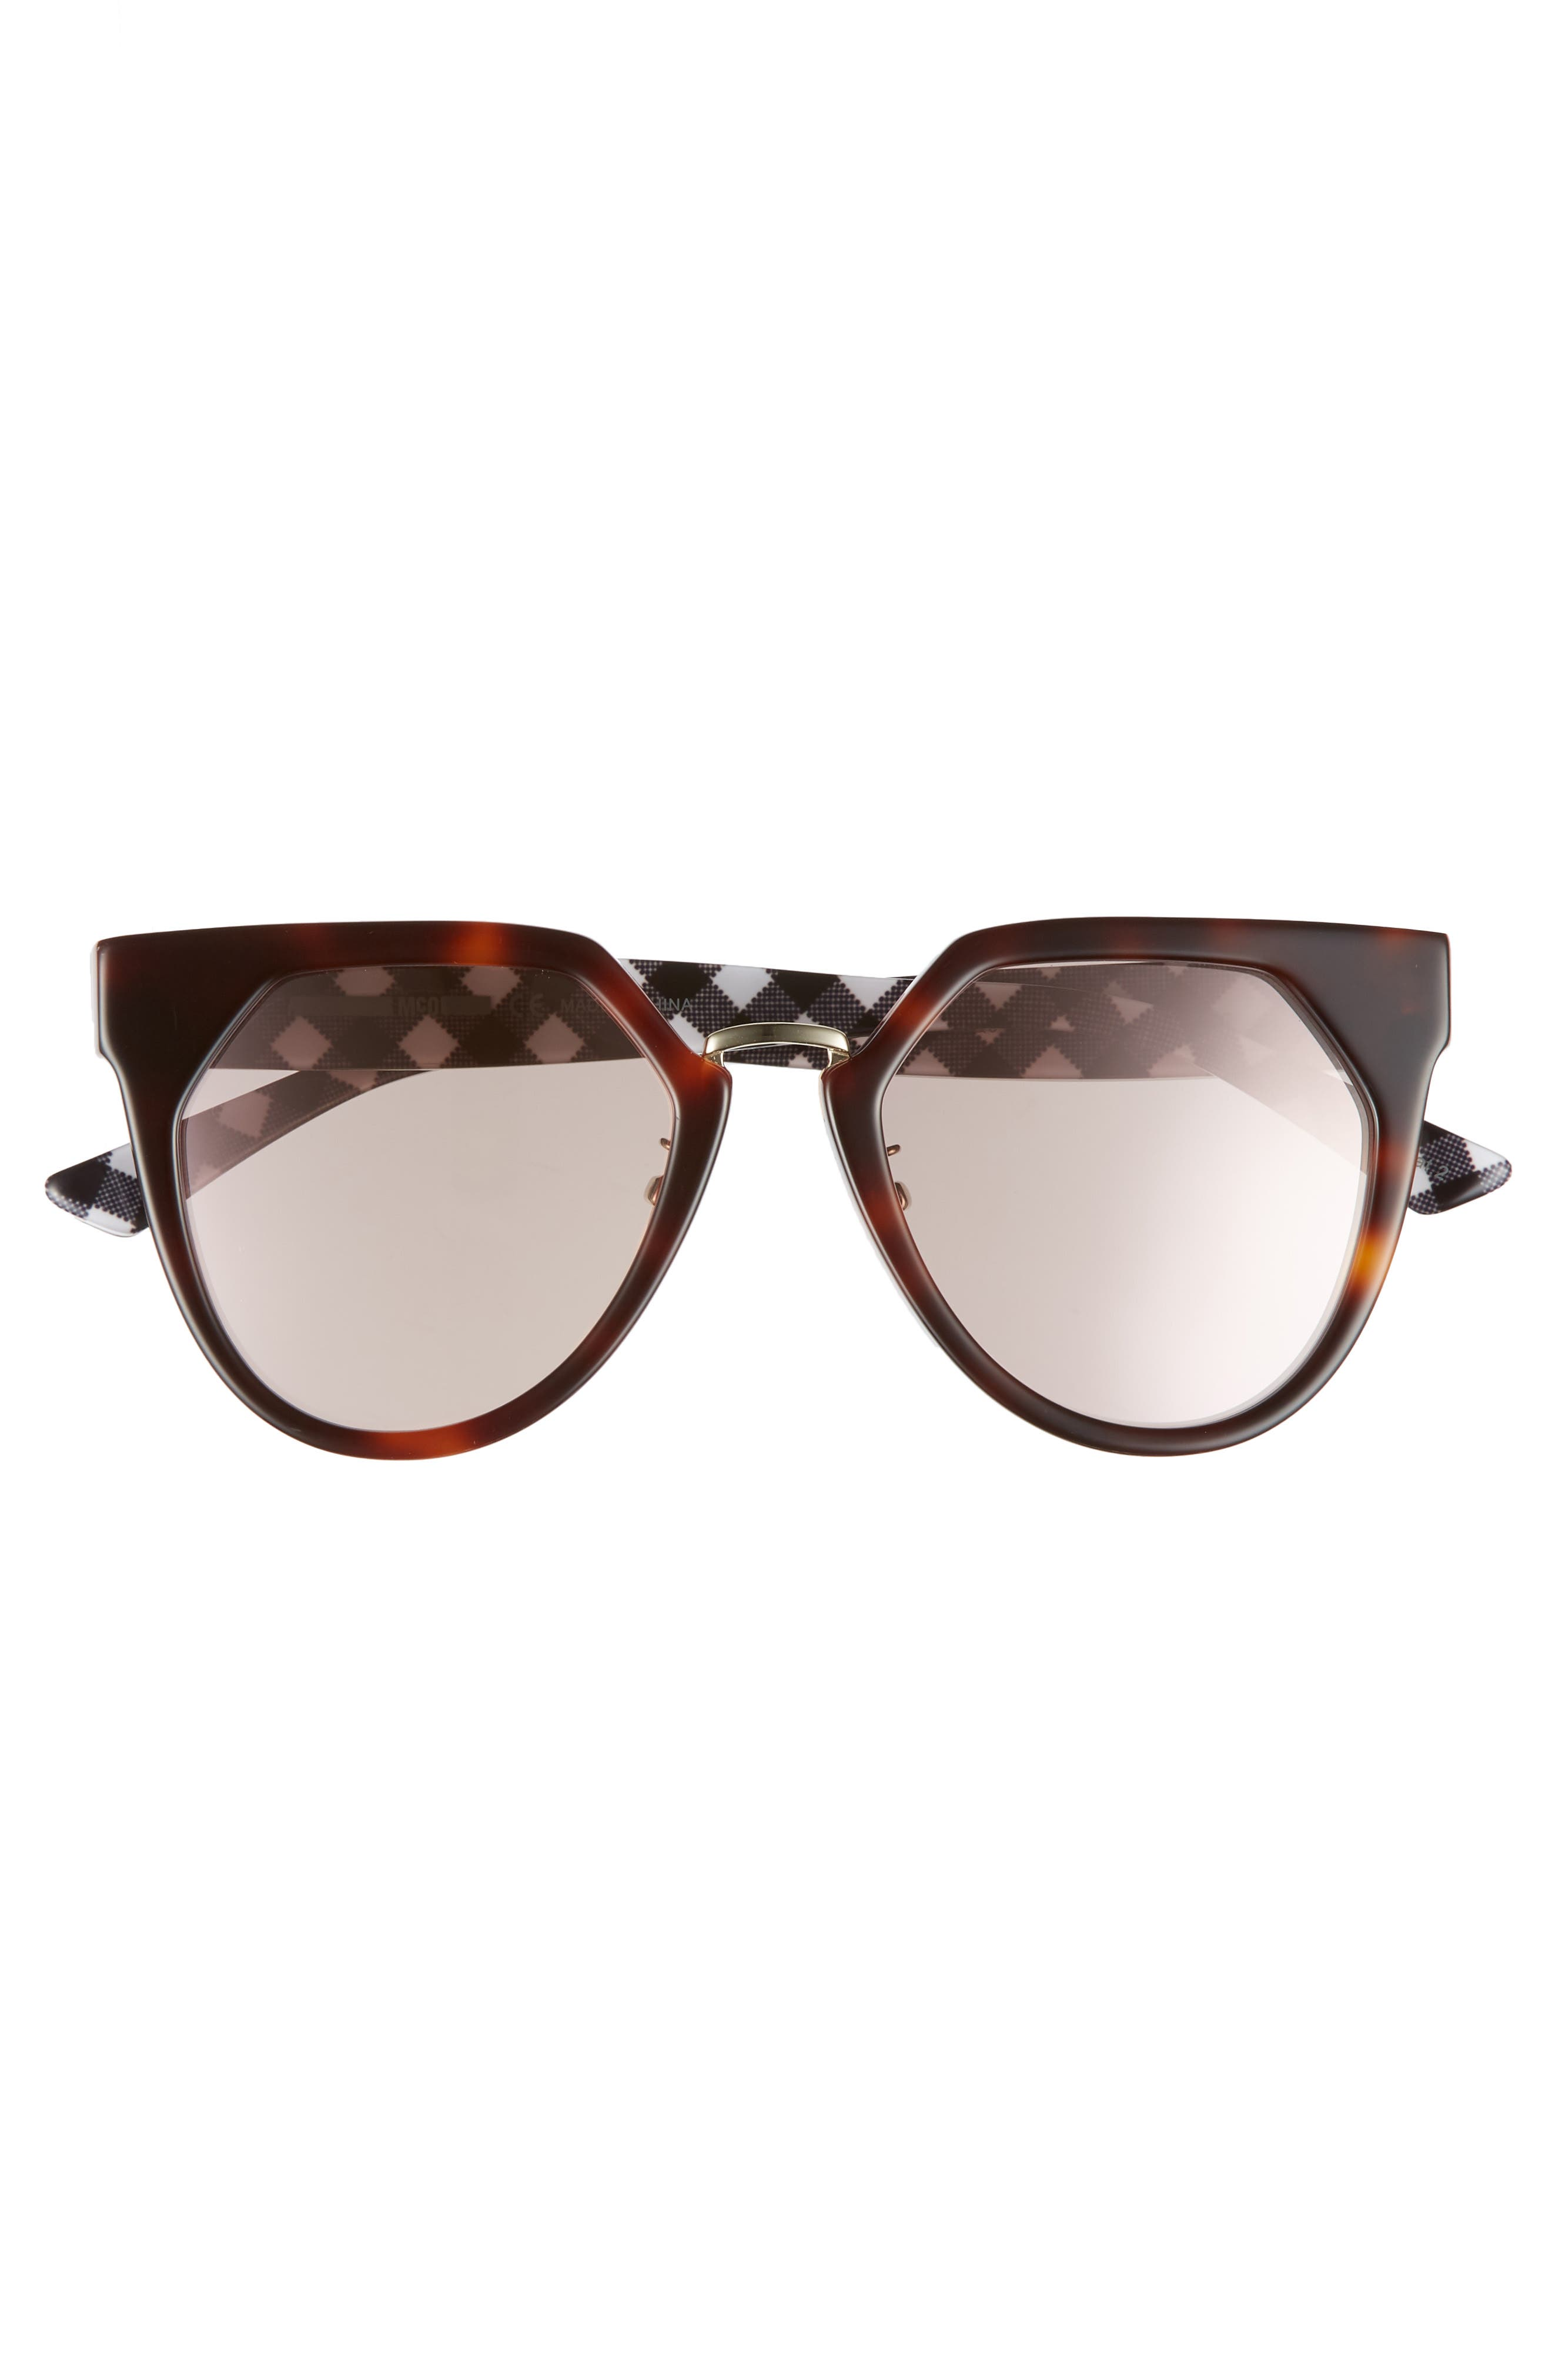 53mm Cat Eye Sunglasses,                             Alternate thumbnail 6, color,